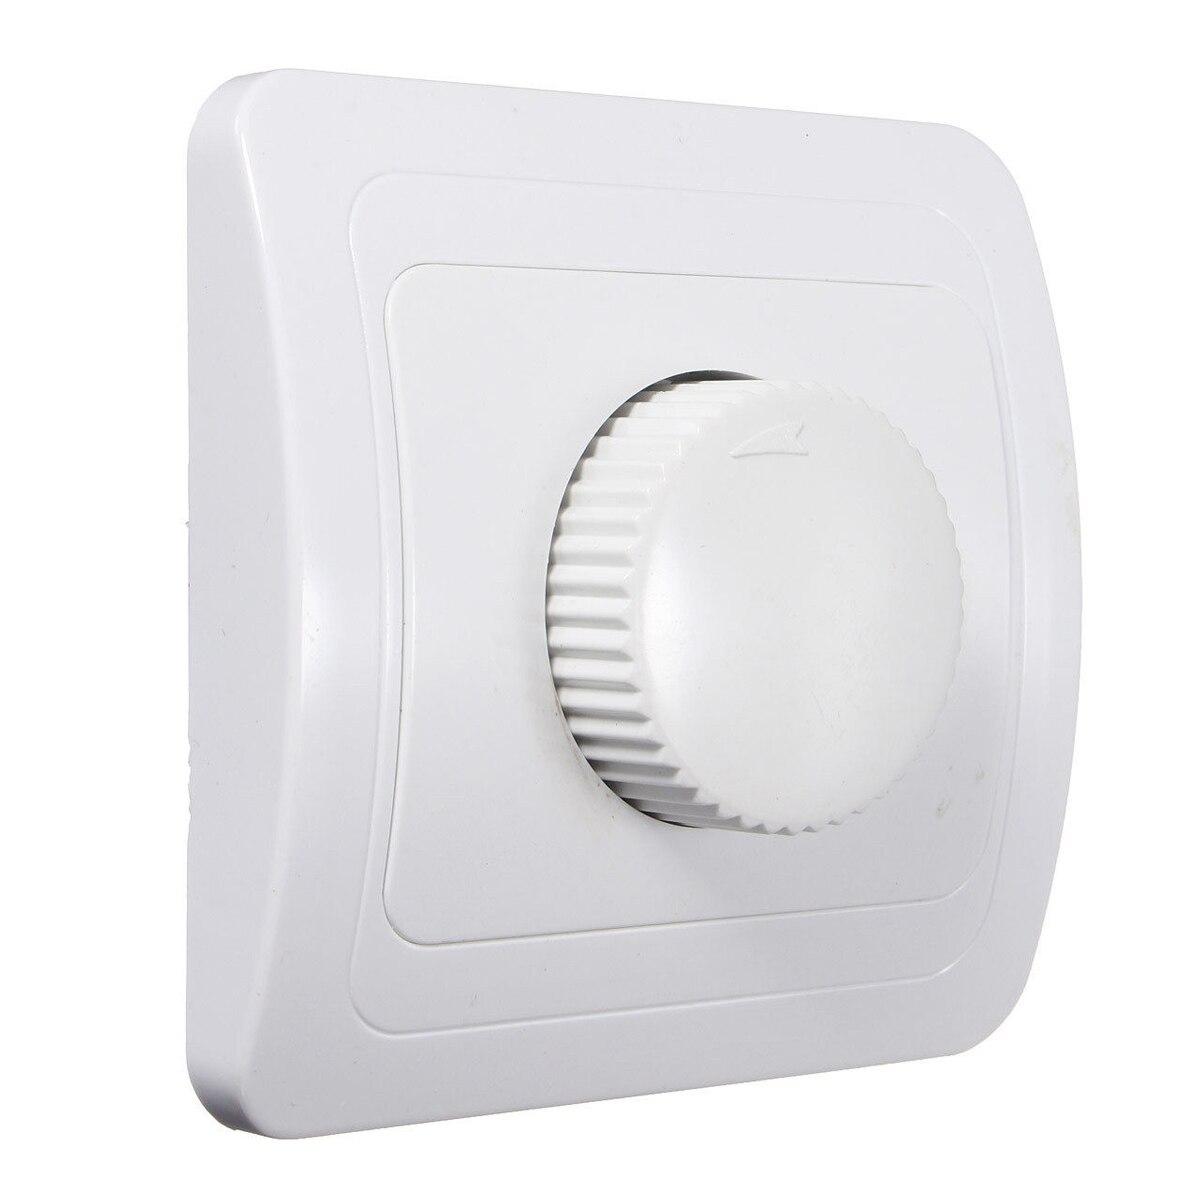 CNIM Hot 110V / 220V Adjustable Controller Dimmer Switch For Dimmable Light Bulb Lamp White bedroom silver tone knob adjustable light controller dimmer switch